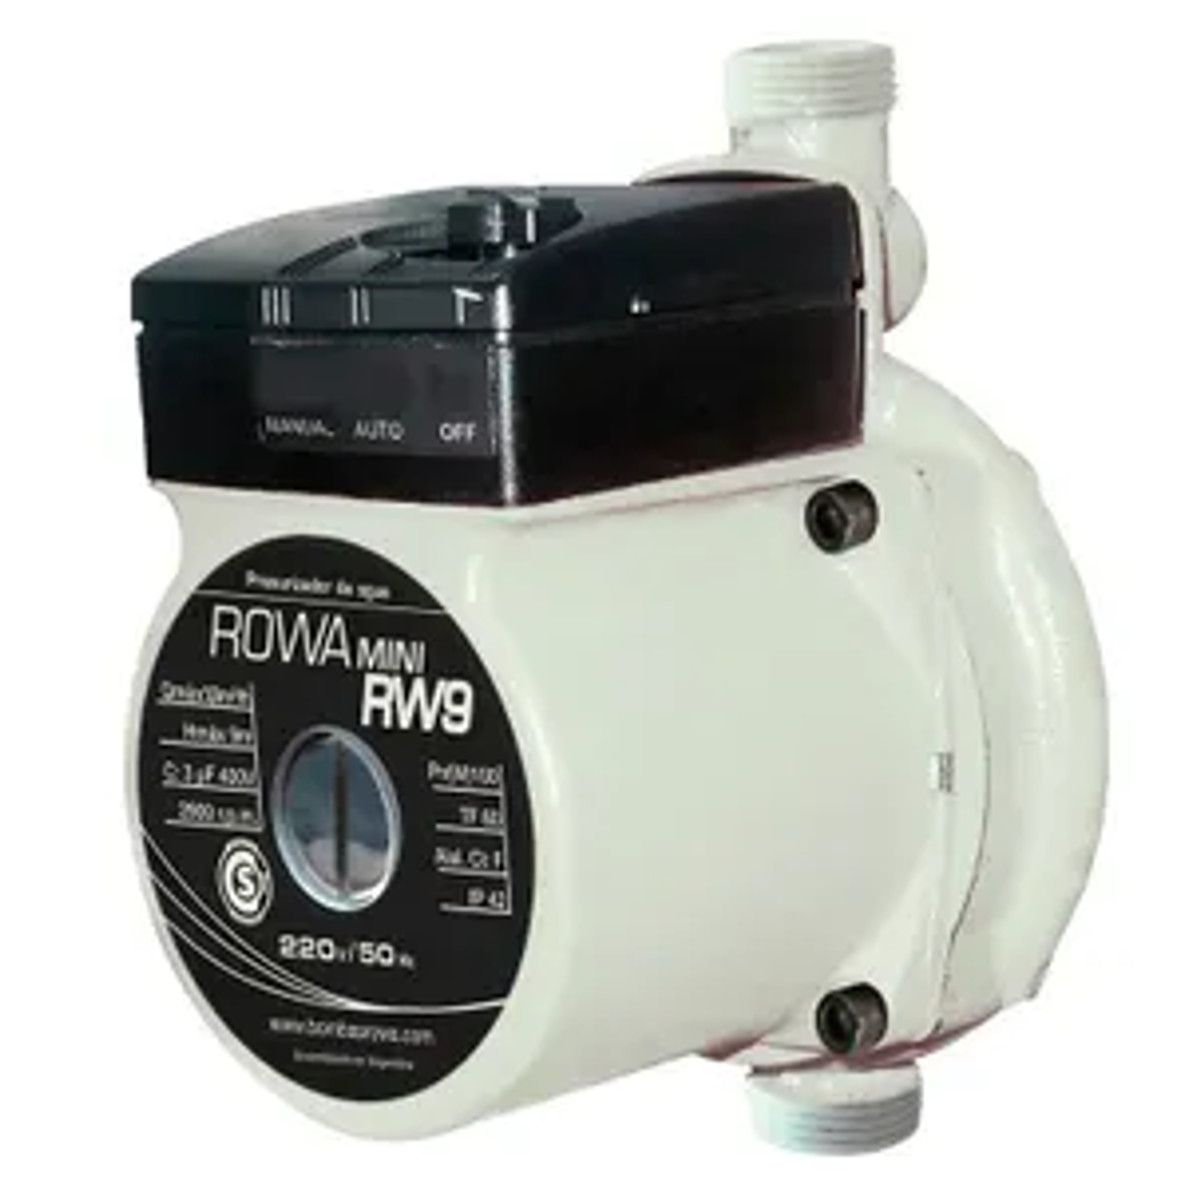 Pressurizador Rowa Mini Rw9 100W Monofásico